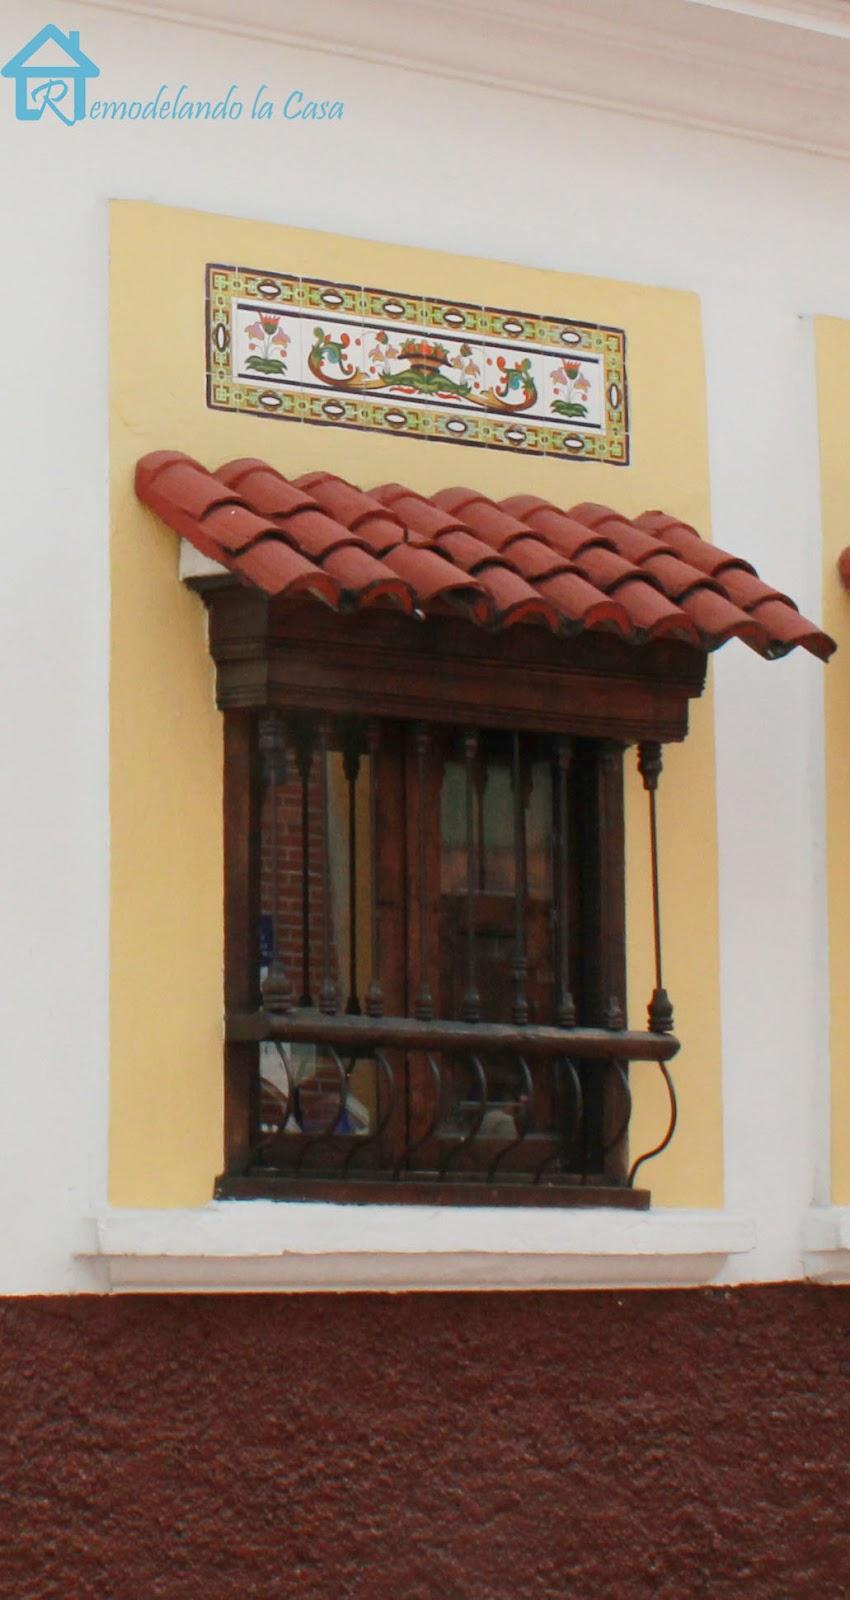 Remodelando los angeles Casa: Other Spanish Style capabilities - Spanish Style Wrought Iron Window Grills